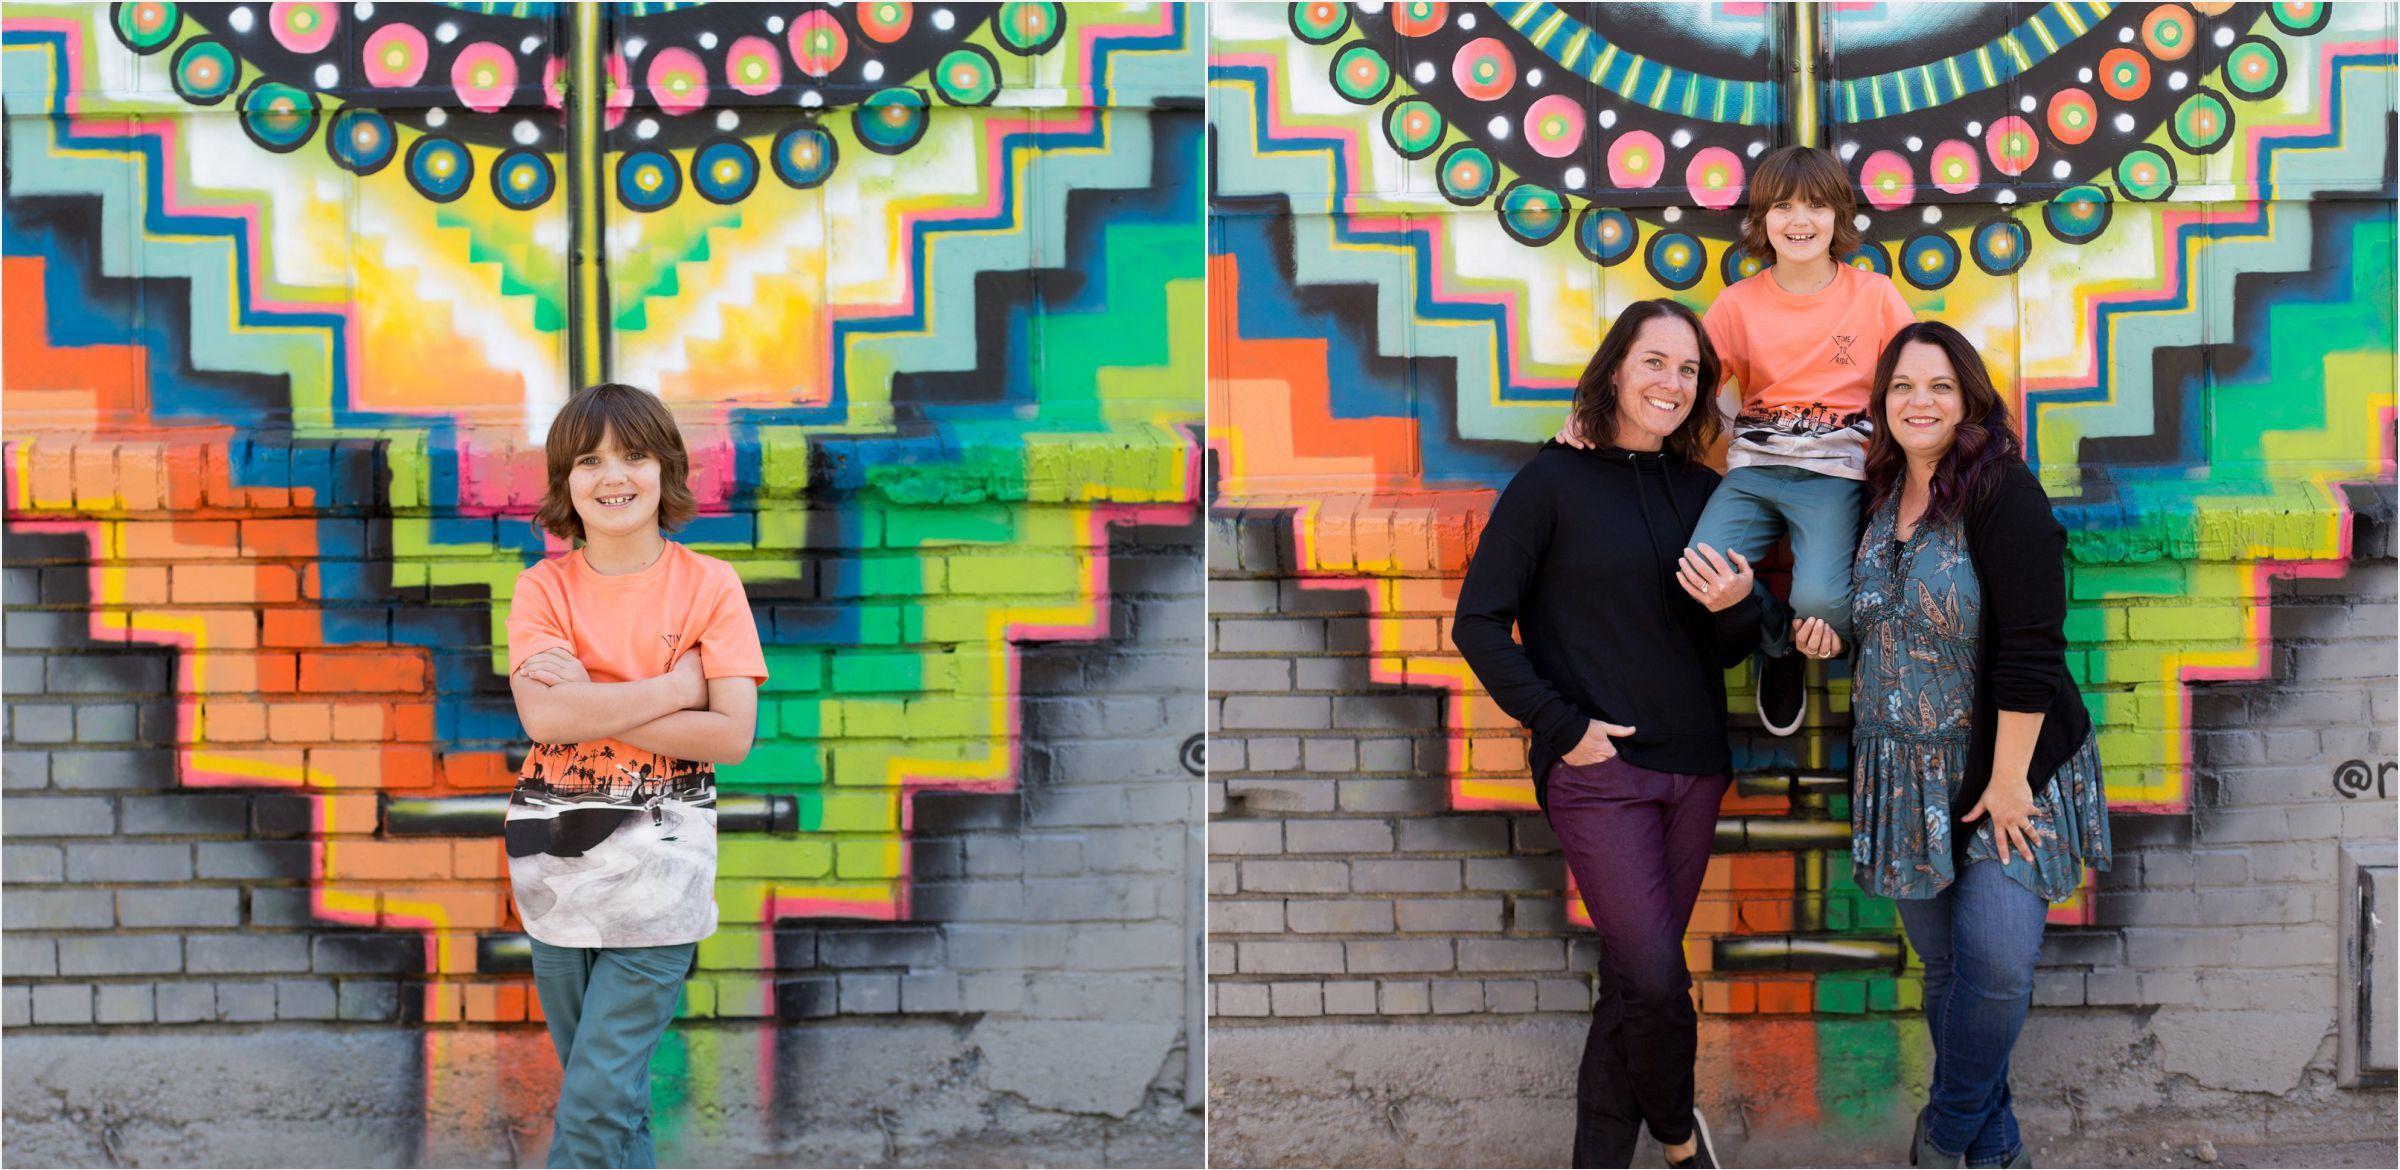 Lesbian-family-photo-shoot-in-rino-denver-colorado-002